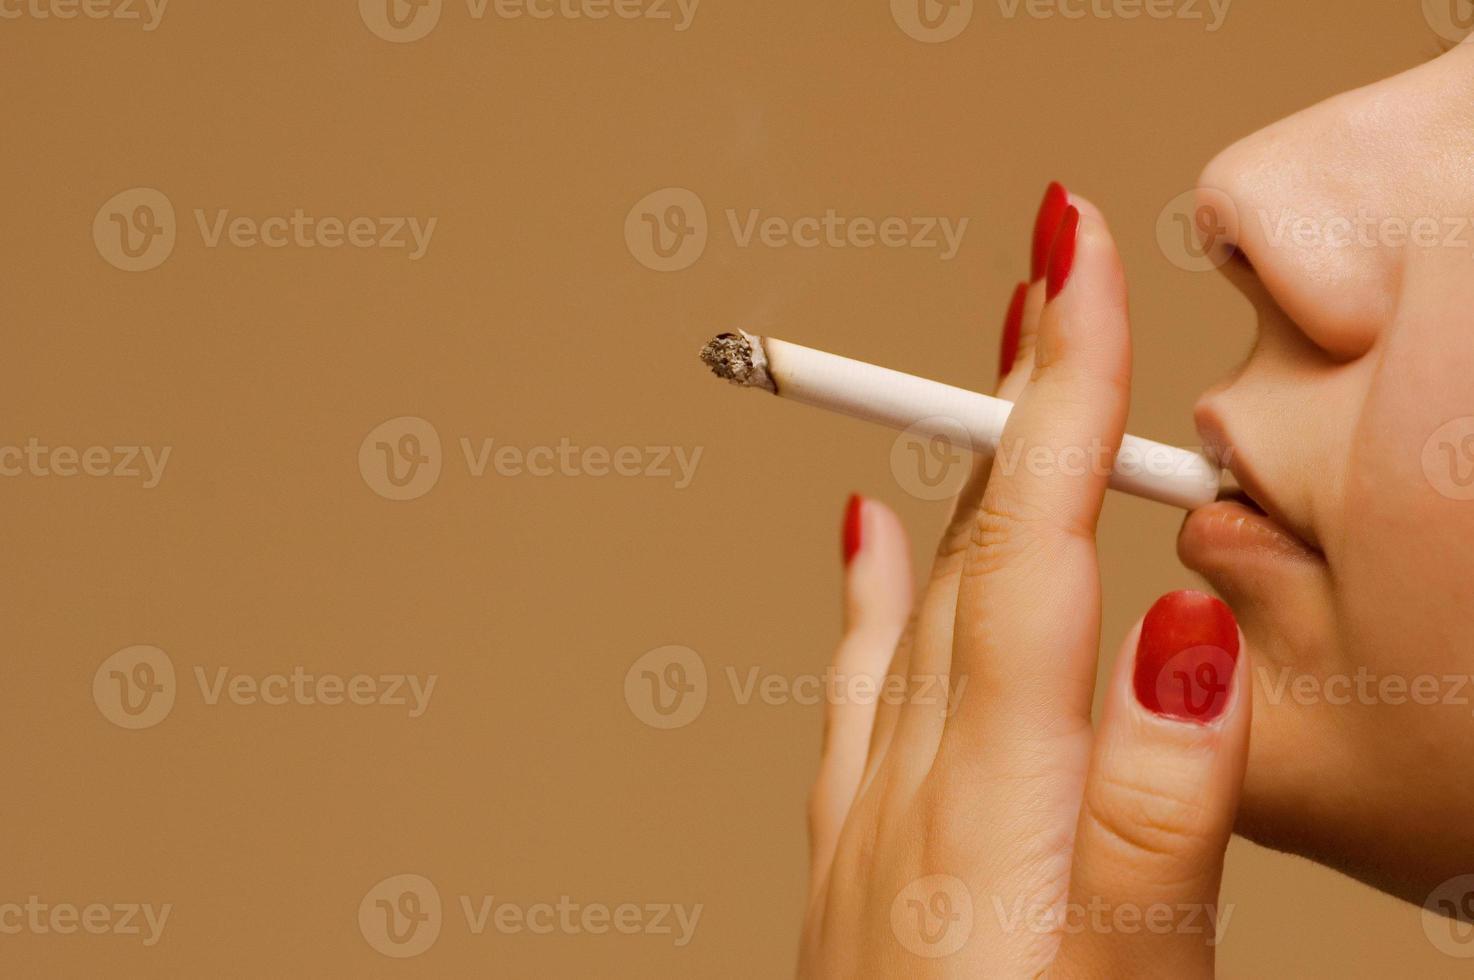 mujer fumando el cigarrillo sobre fondo naranja foto